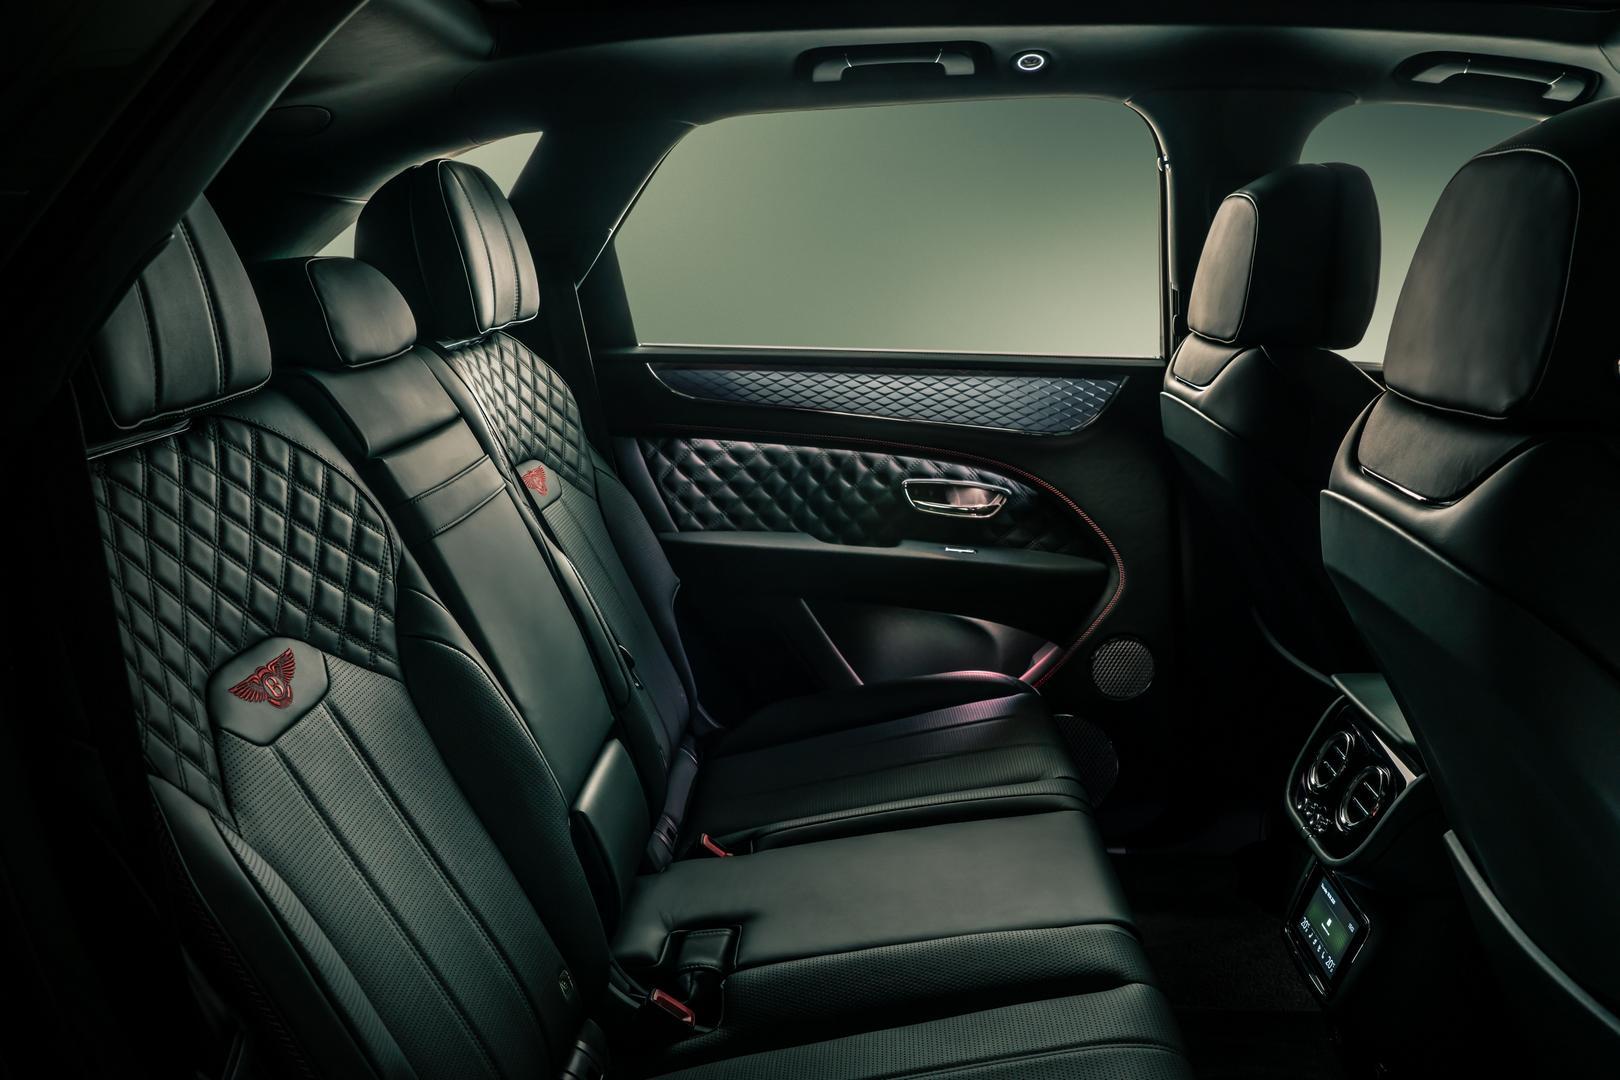 2021 Bentley Bentayga Seats